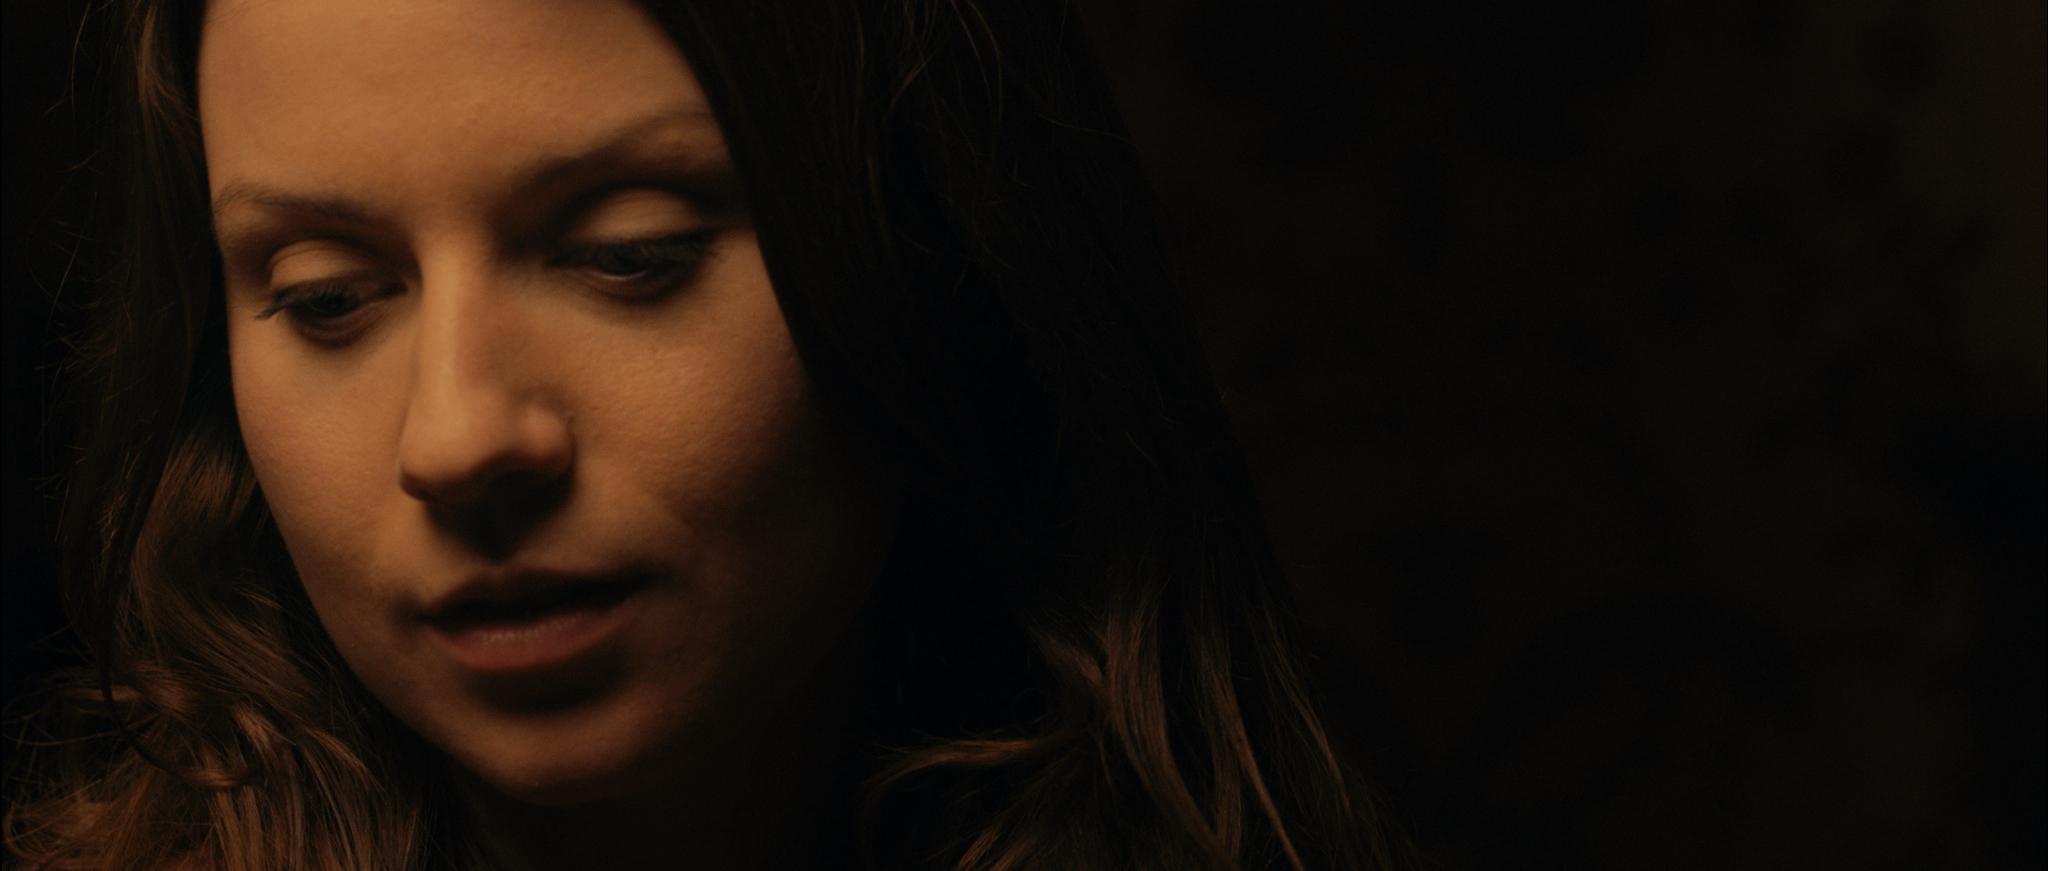 Siren promo still - Elizabeth 1